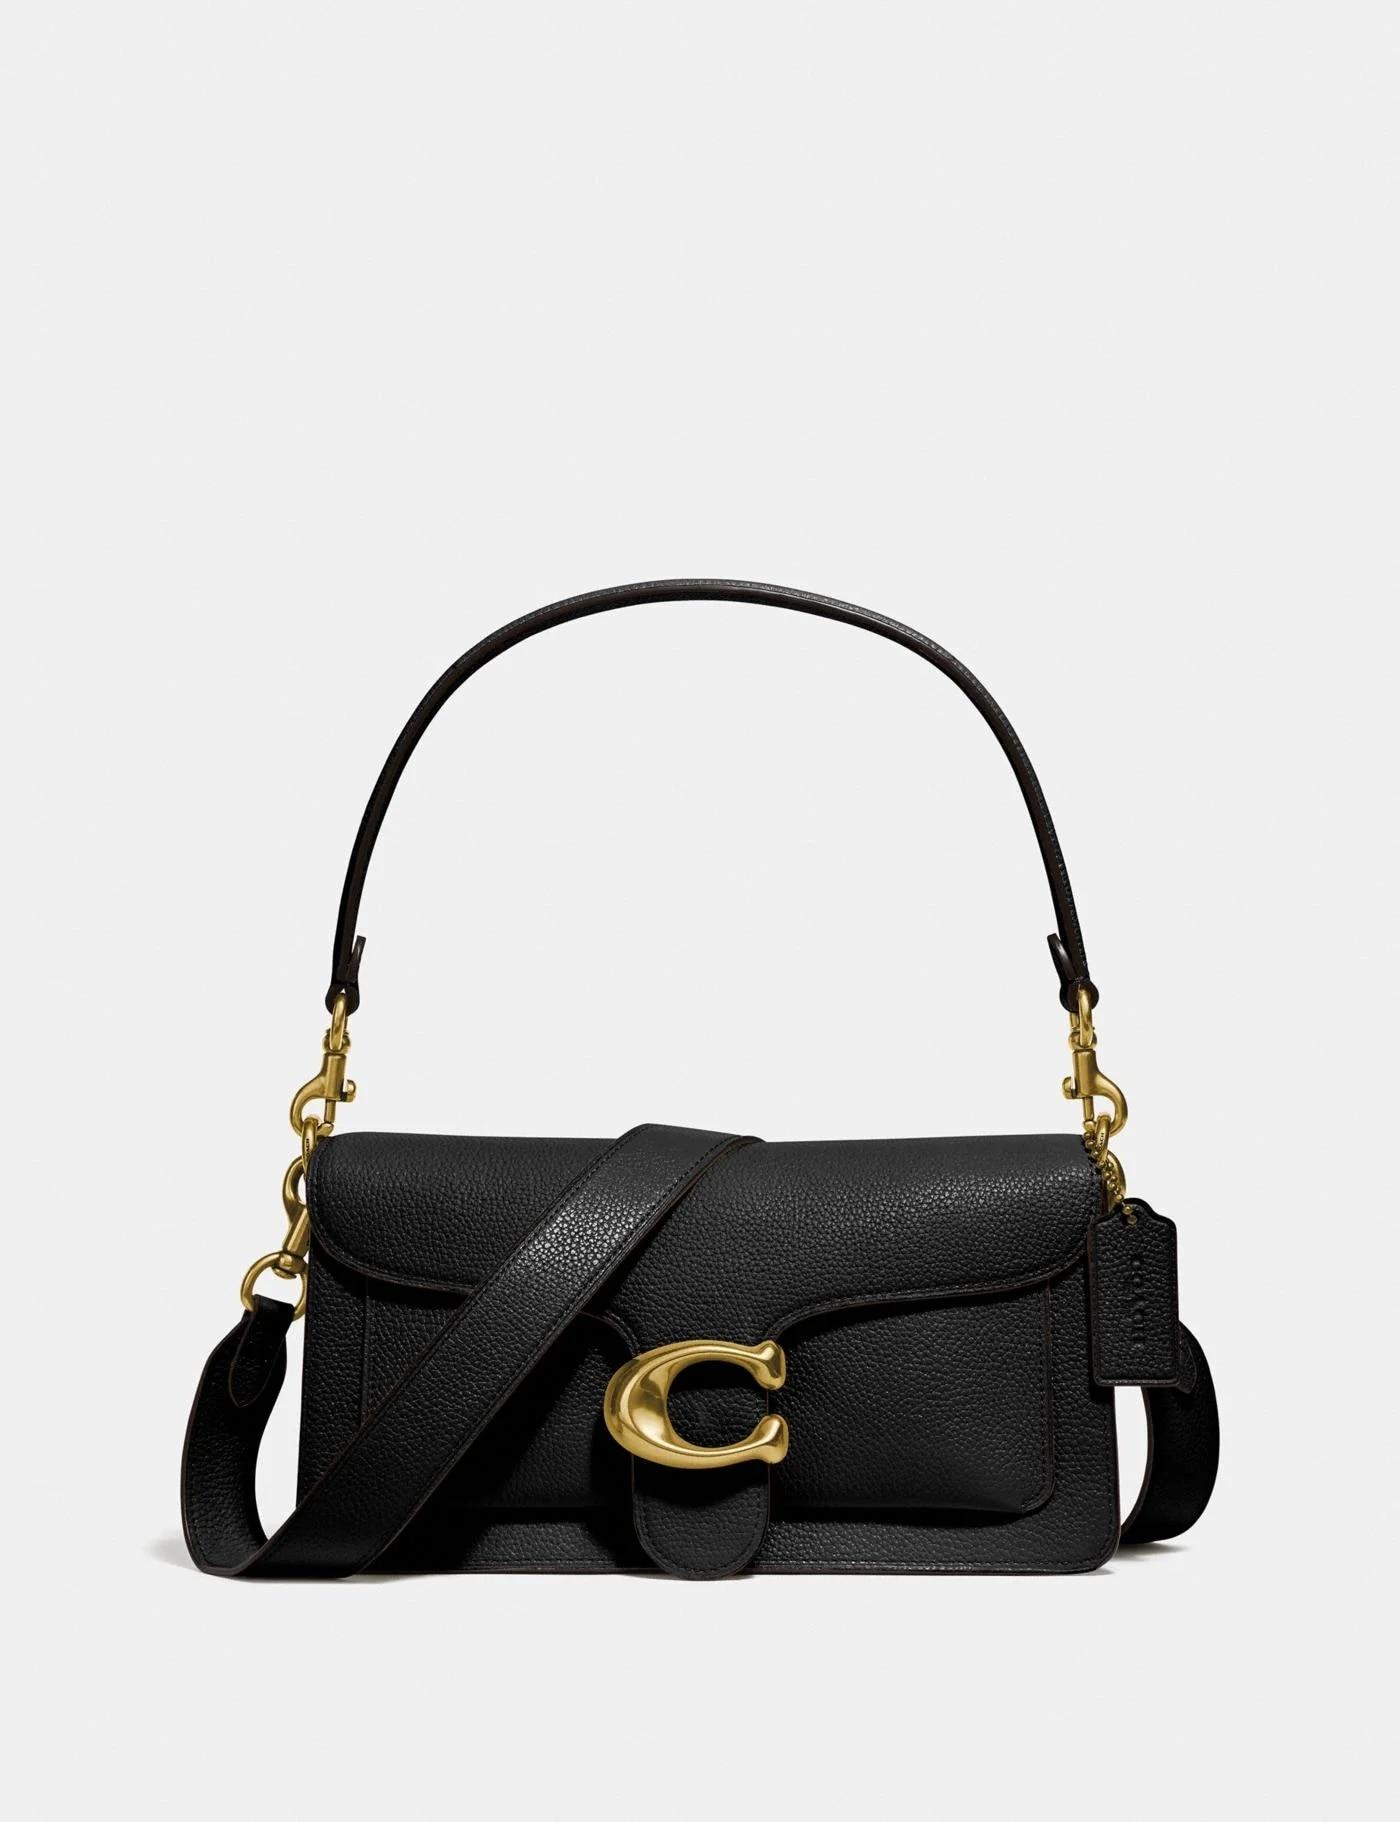 Coach Tabby Shoulder Bag 26 Women Messenger Bag Shoulder Bag Fashion Small Bags 73995